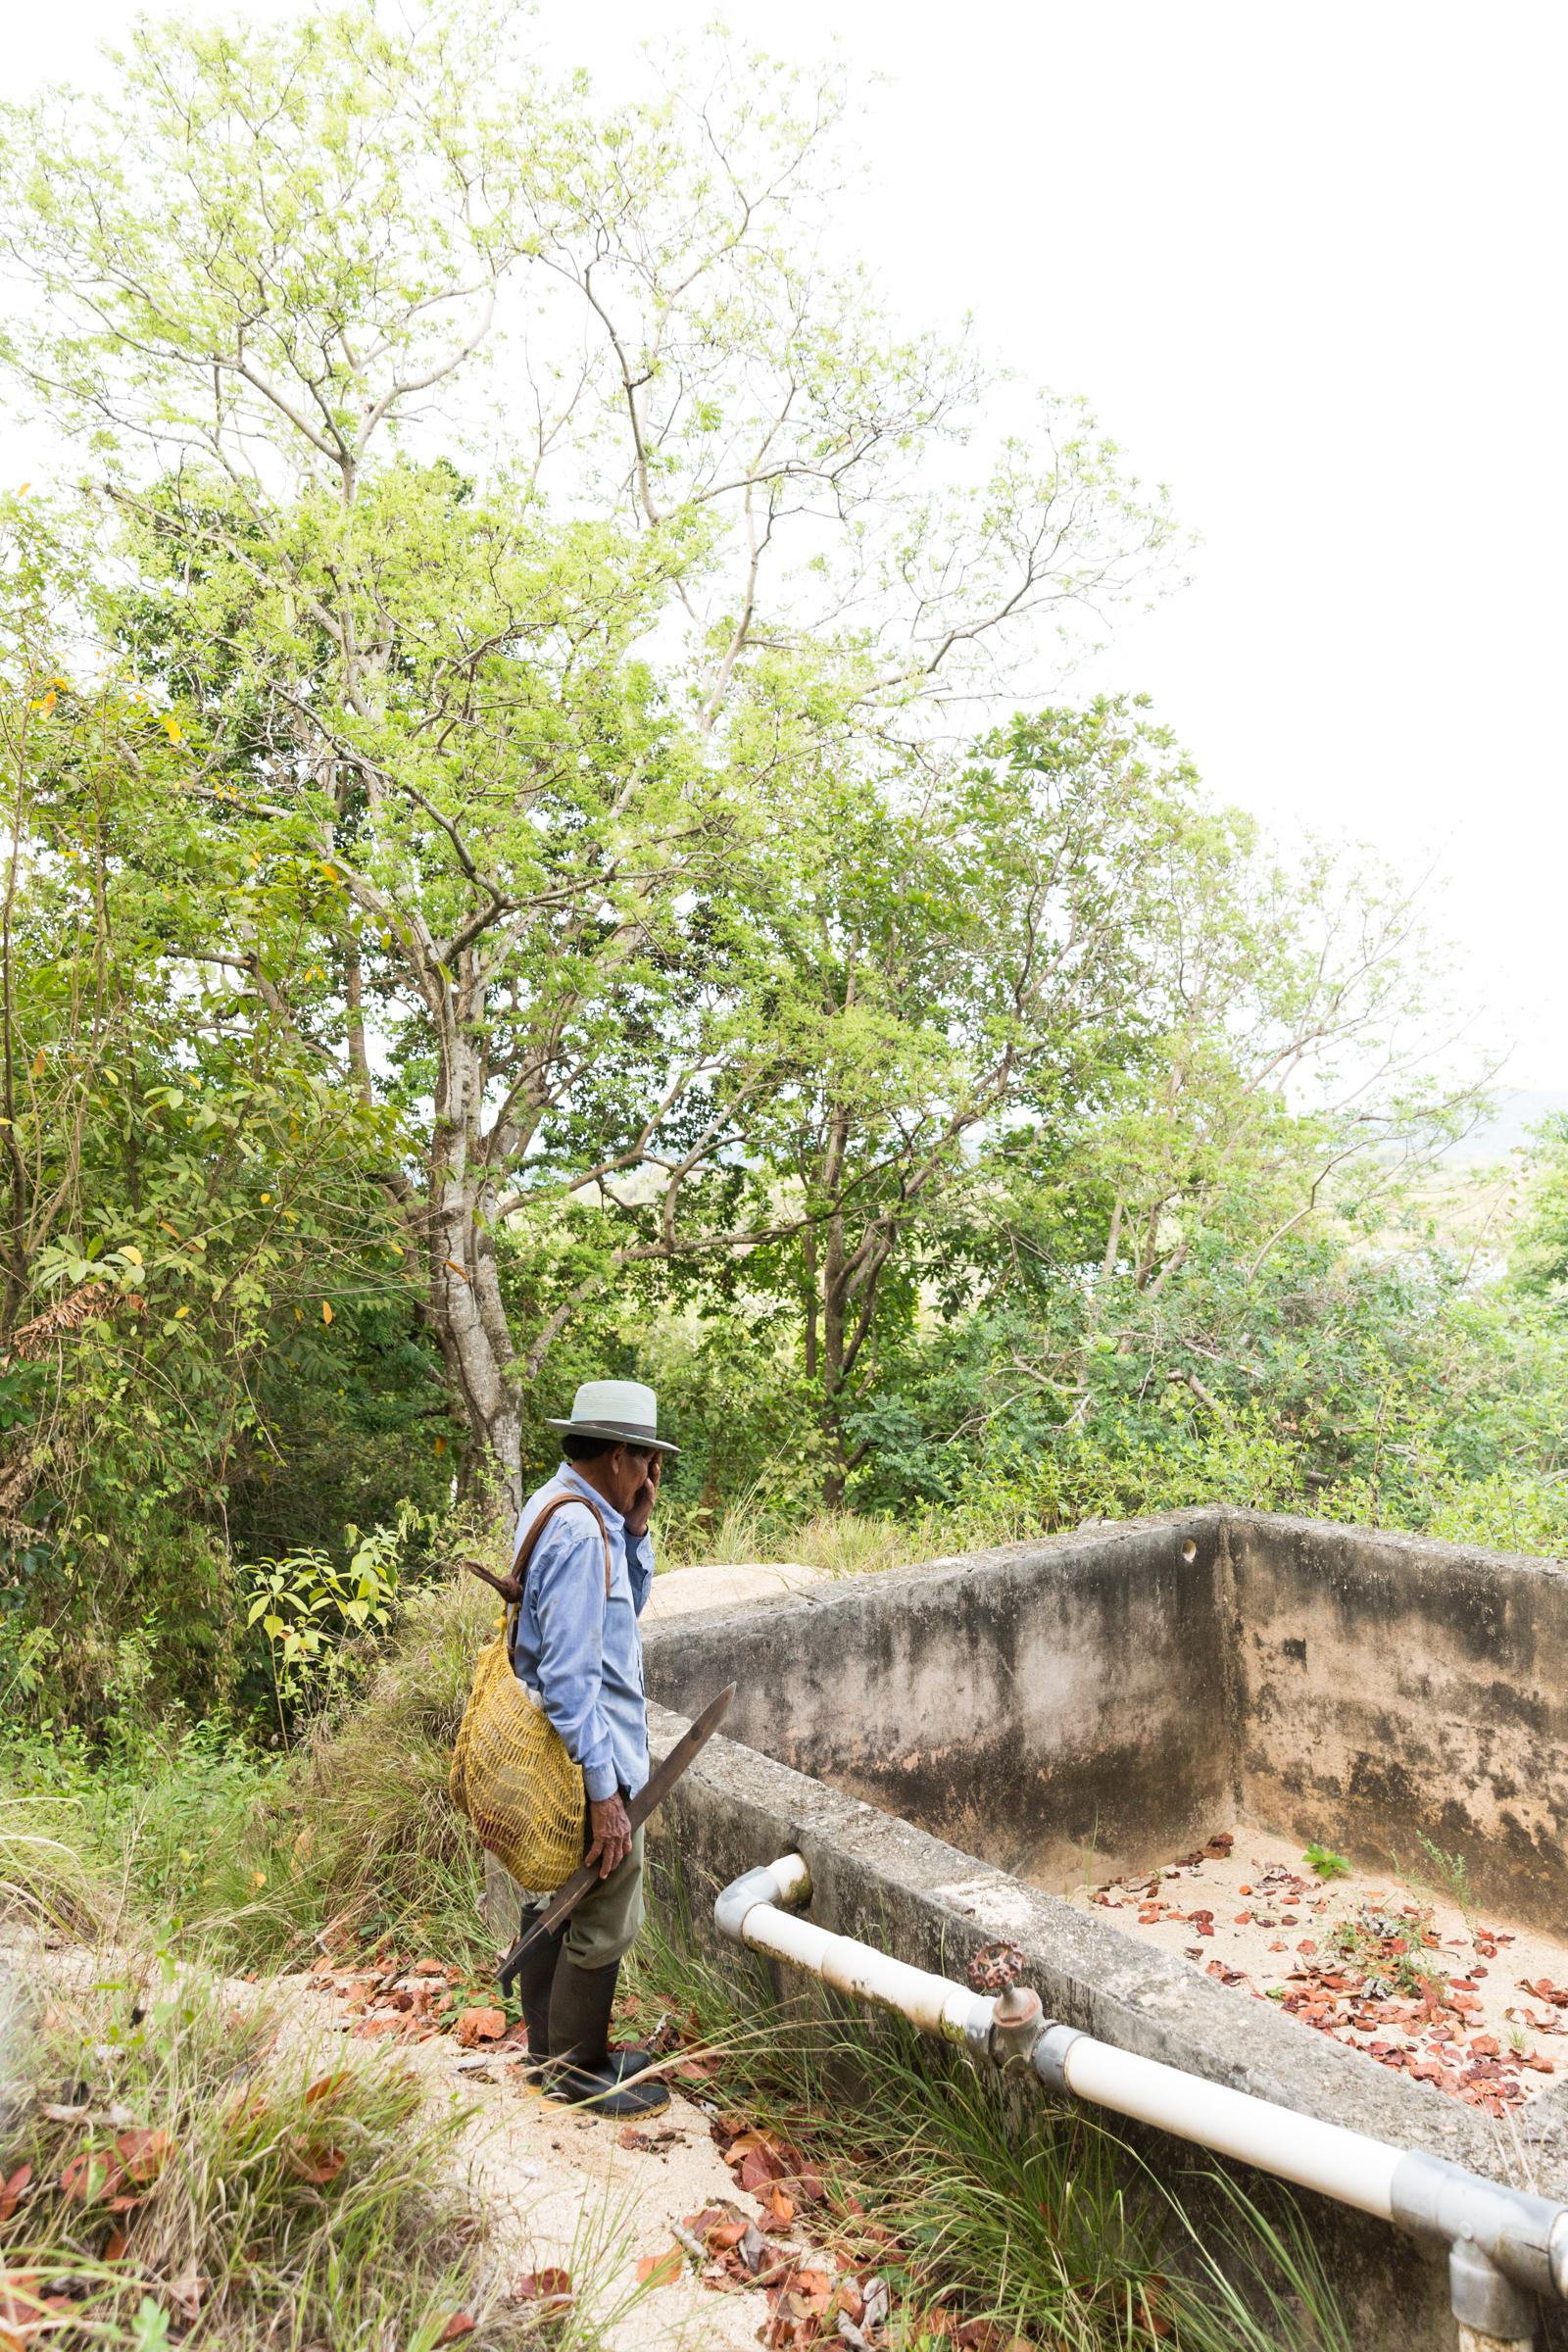 Saila Leonidas Perez by a dry water reservoir on the mainland near the Coetupu community.